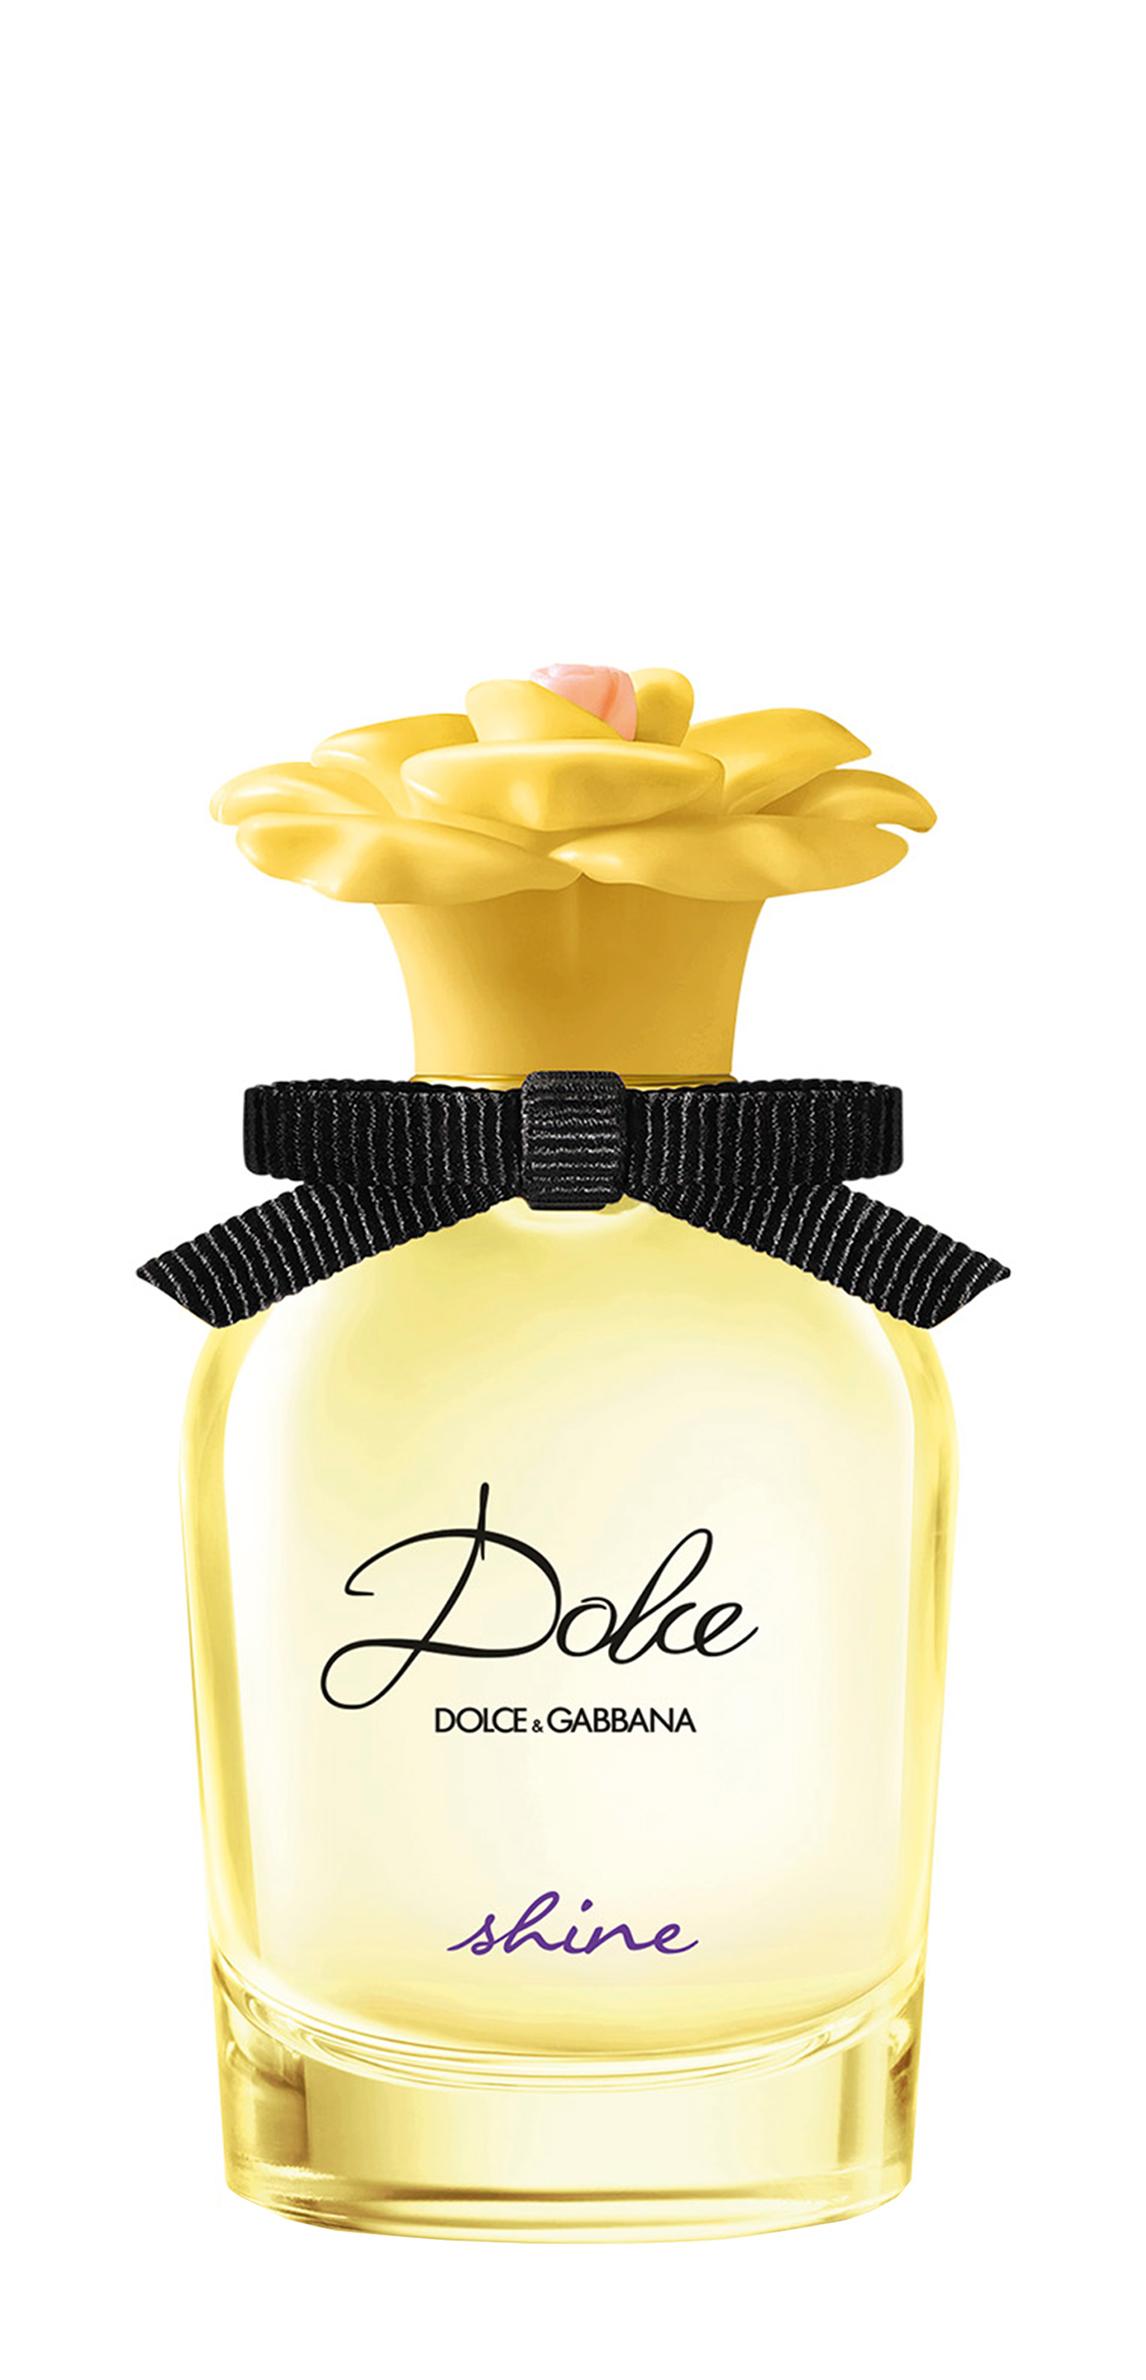 Купить Парфюмерная вода Dolce & Gabbana Dolce Shine Eau De Parfum 30 мл, DOLCE&GABBANA